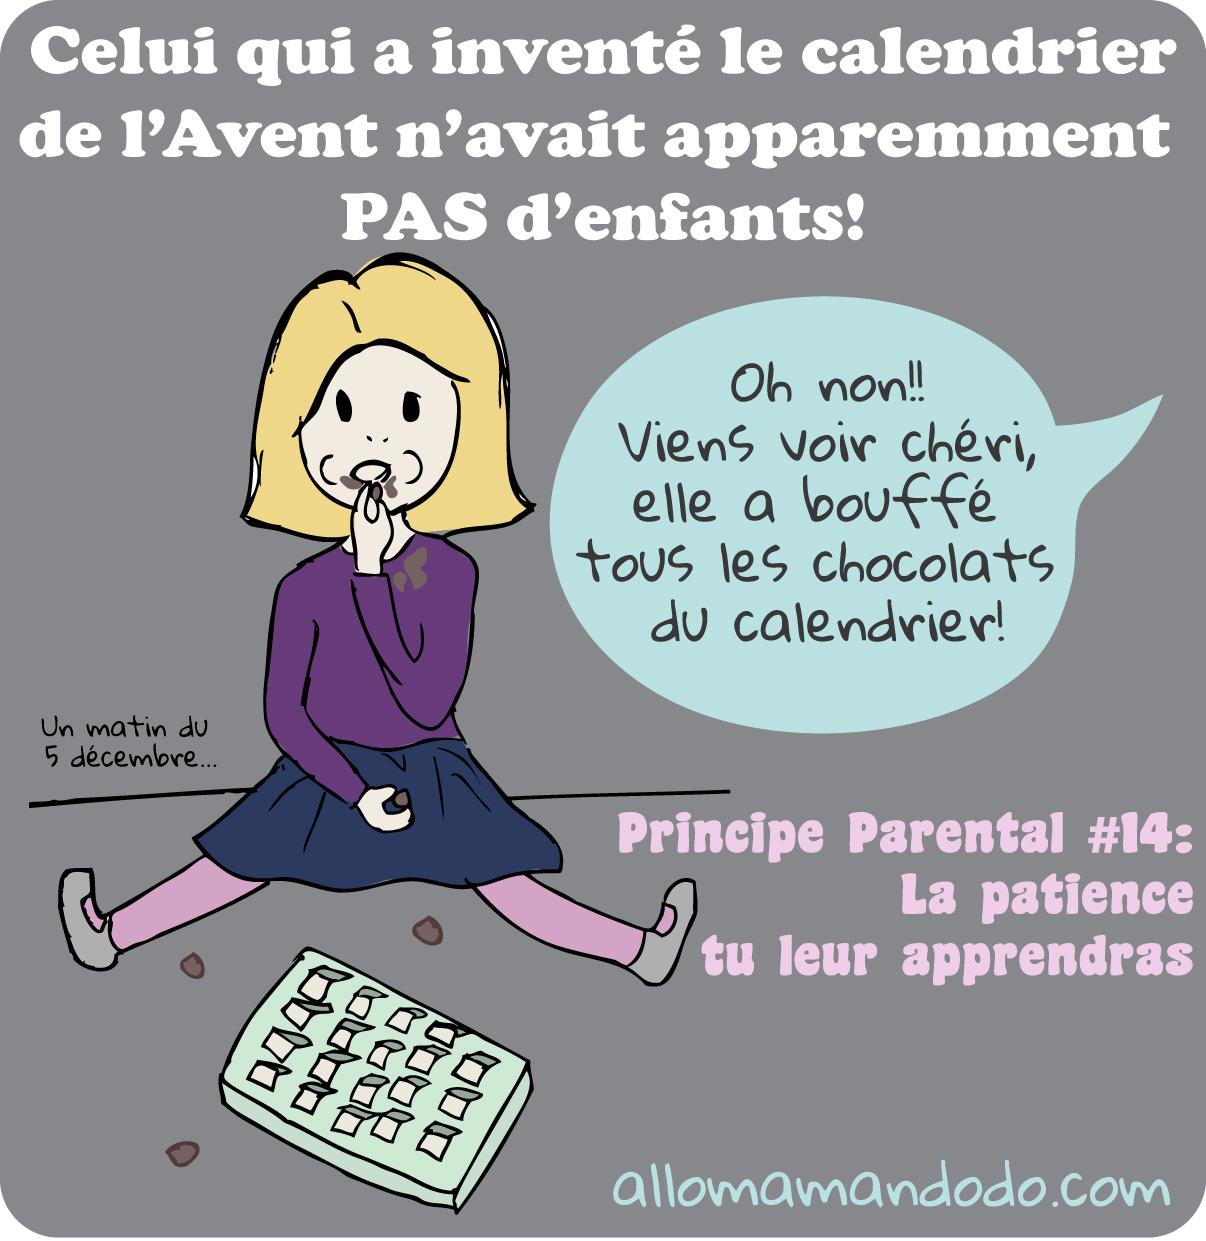 Calendrier De Lavent Humour.Principe Parental 14 La Patience Tu Leur Apprendras